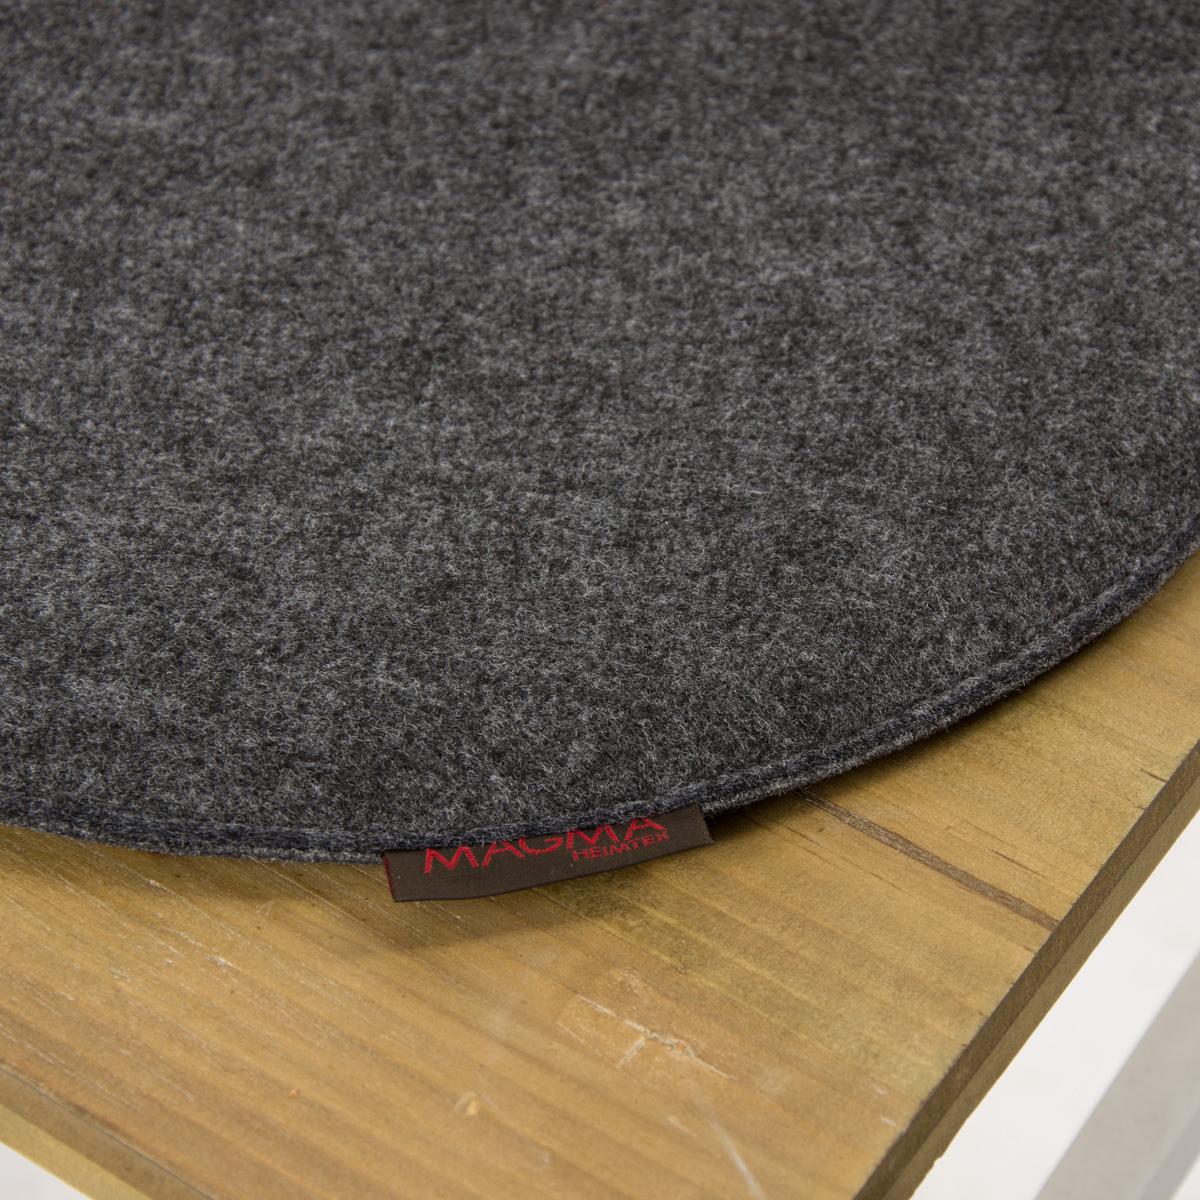 Stuhlkissen Avaro Filz Rund Anthrazit Meliert 35x2cm